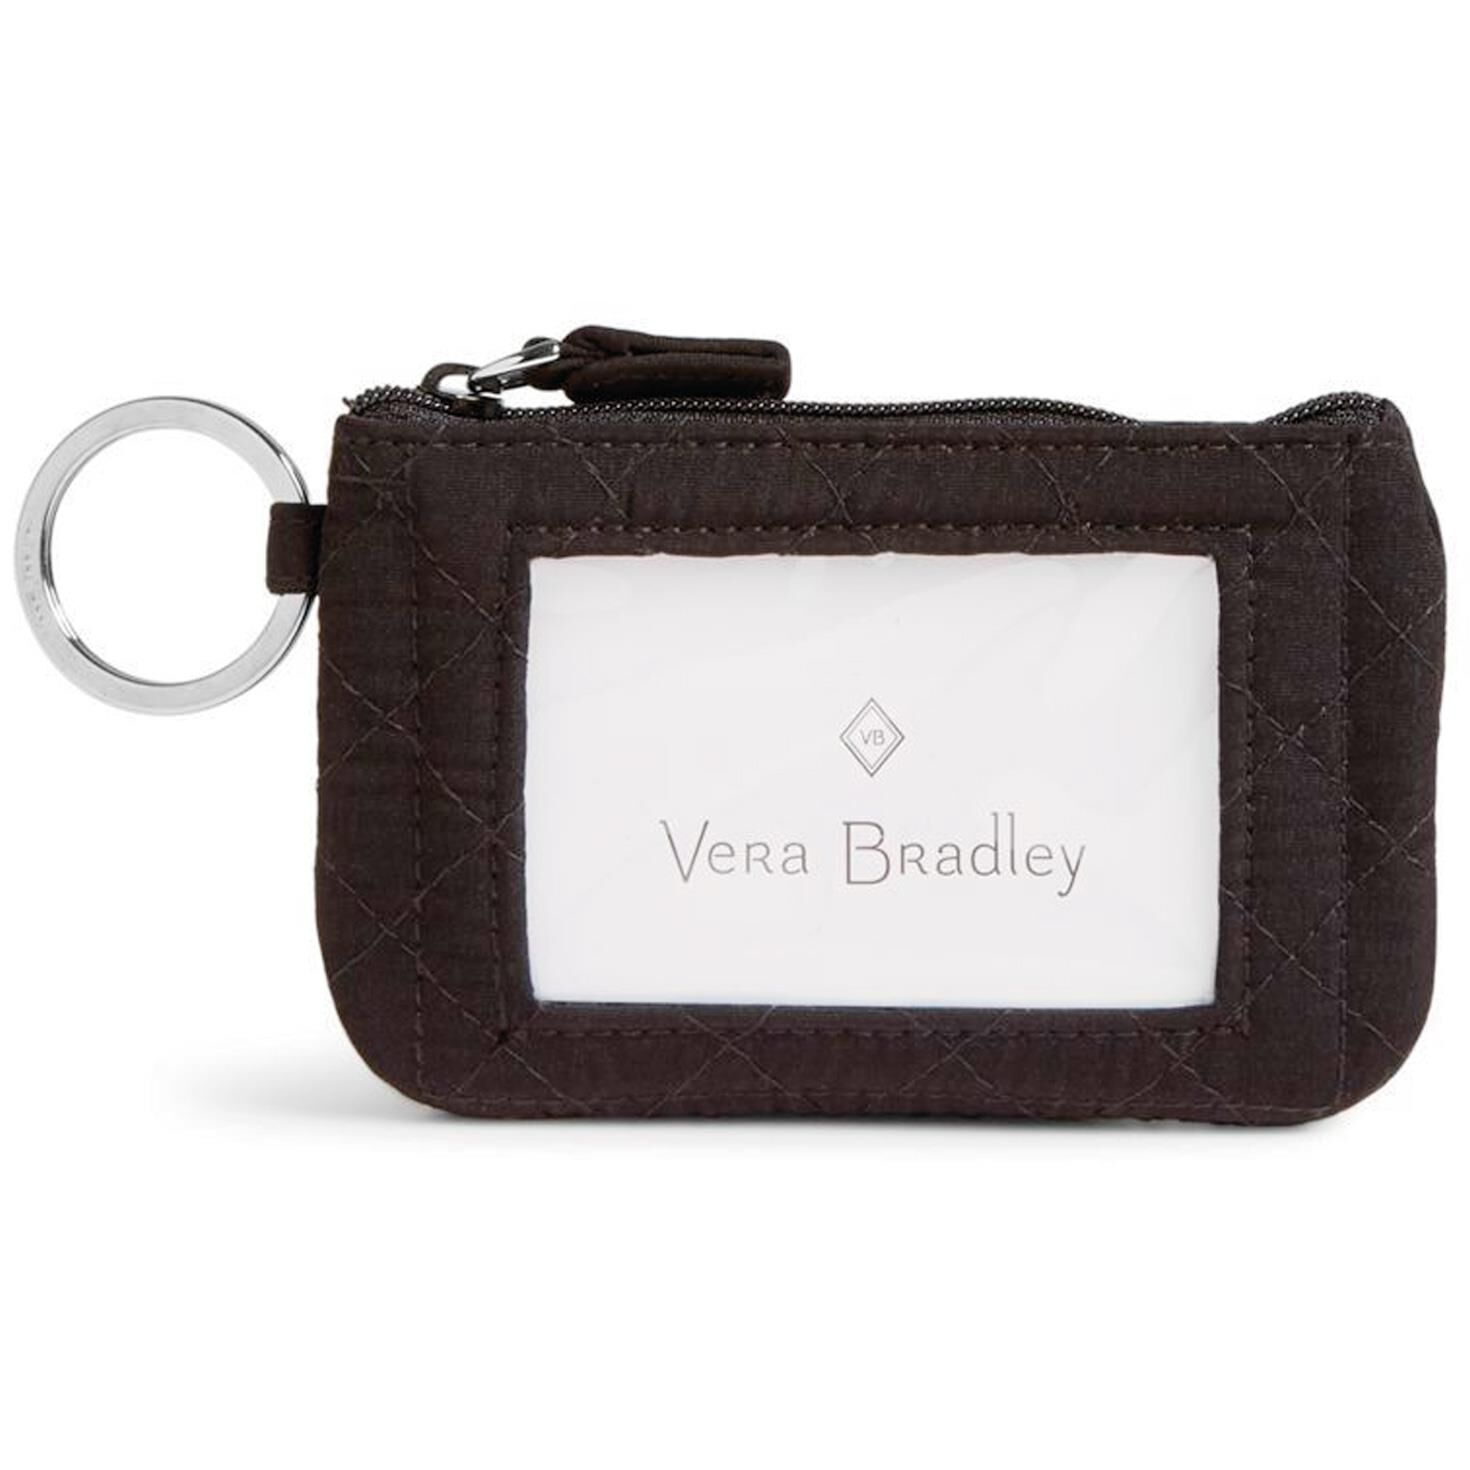 4d70f69cfe Vera Bradley Compact Wallet - Best Photo Wallet Justiceforkenny.Org